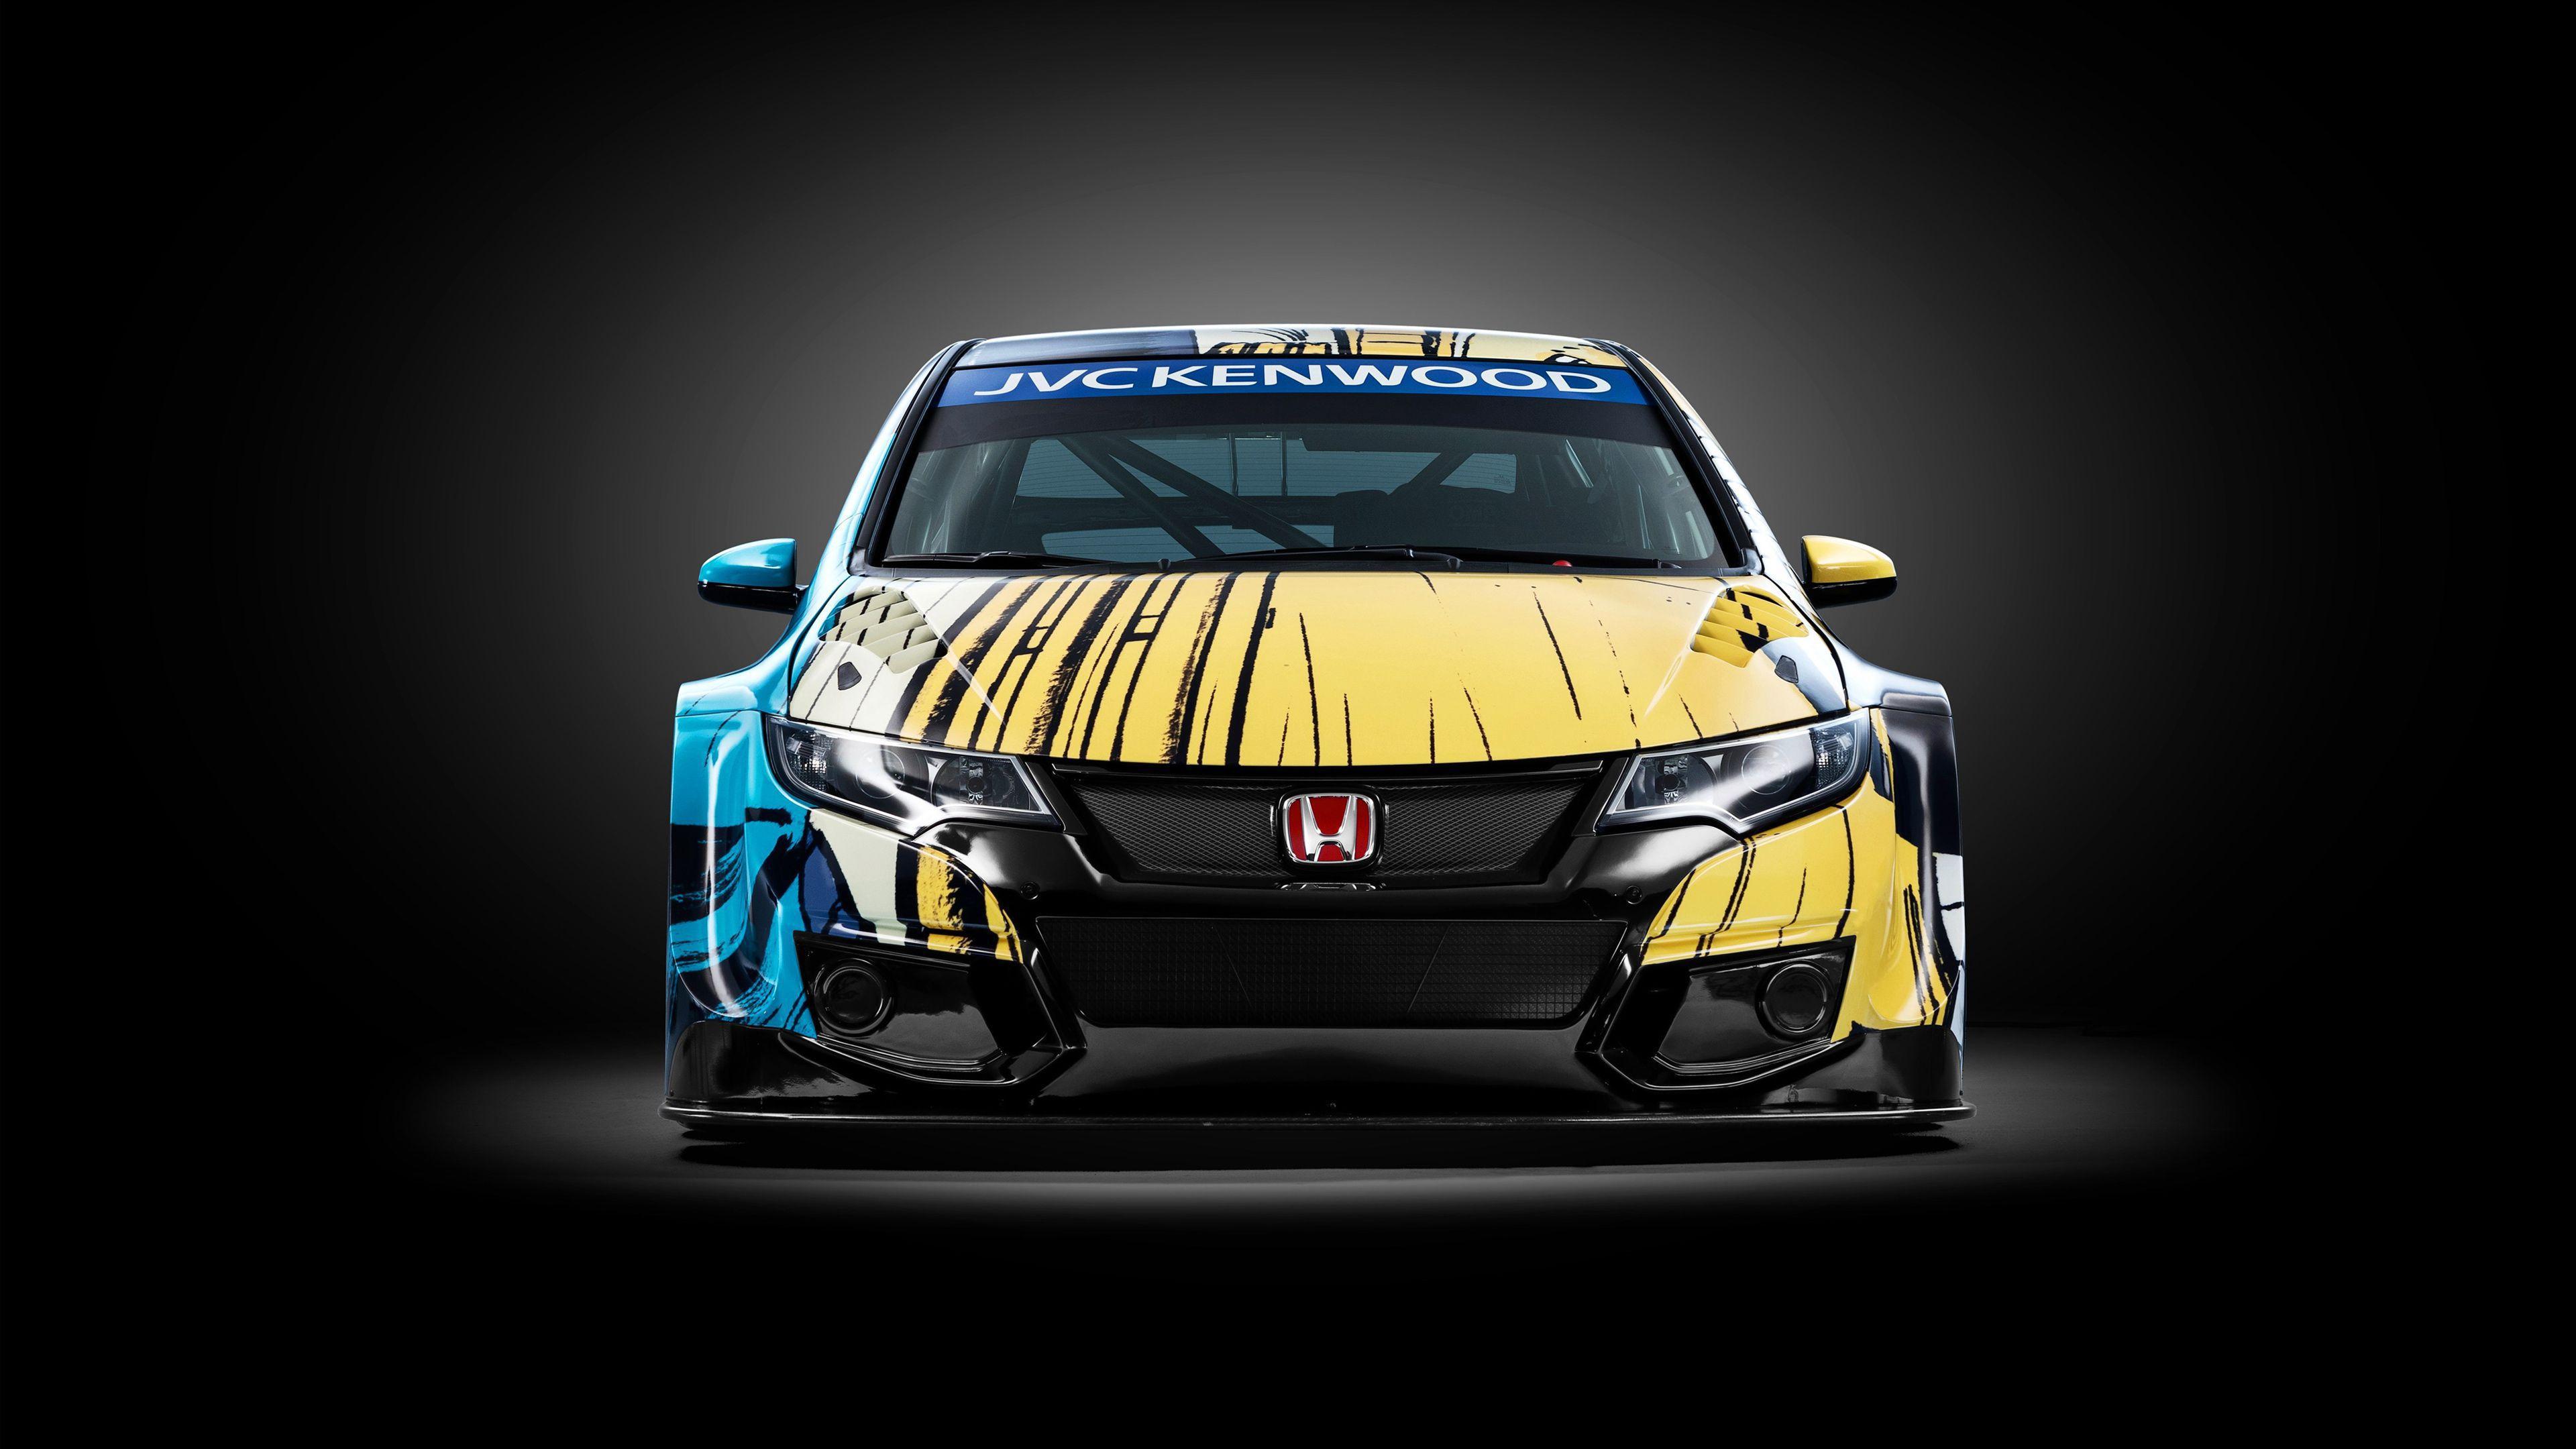 Honda Civic High Quality Wallpapers